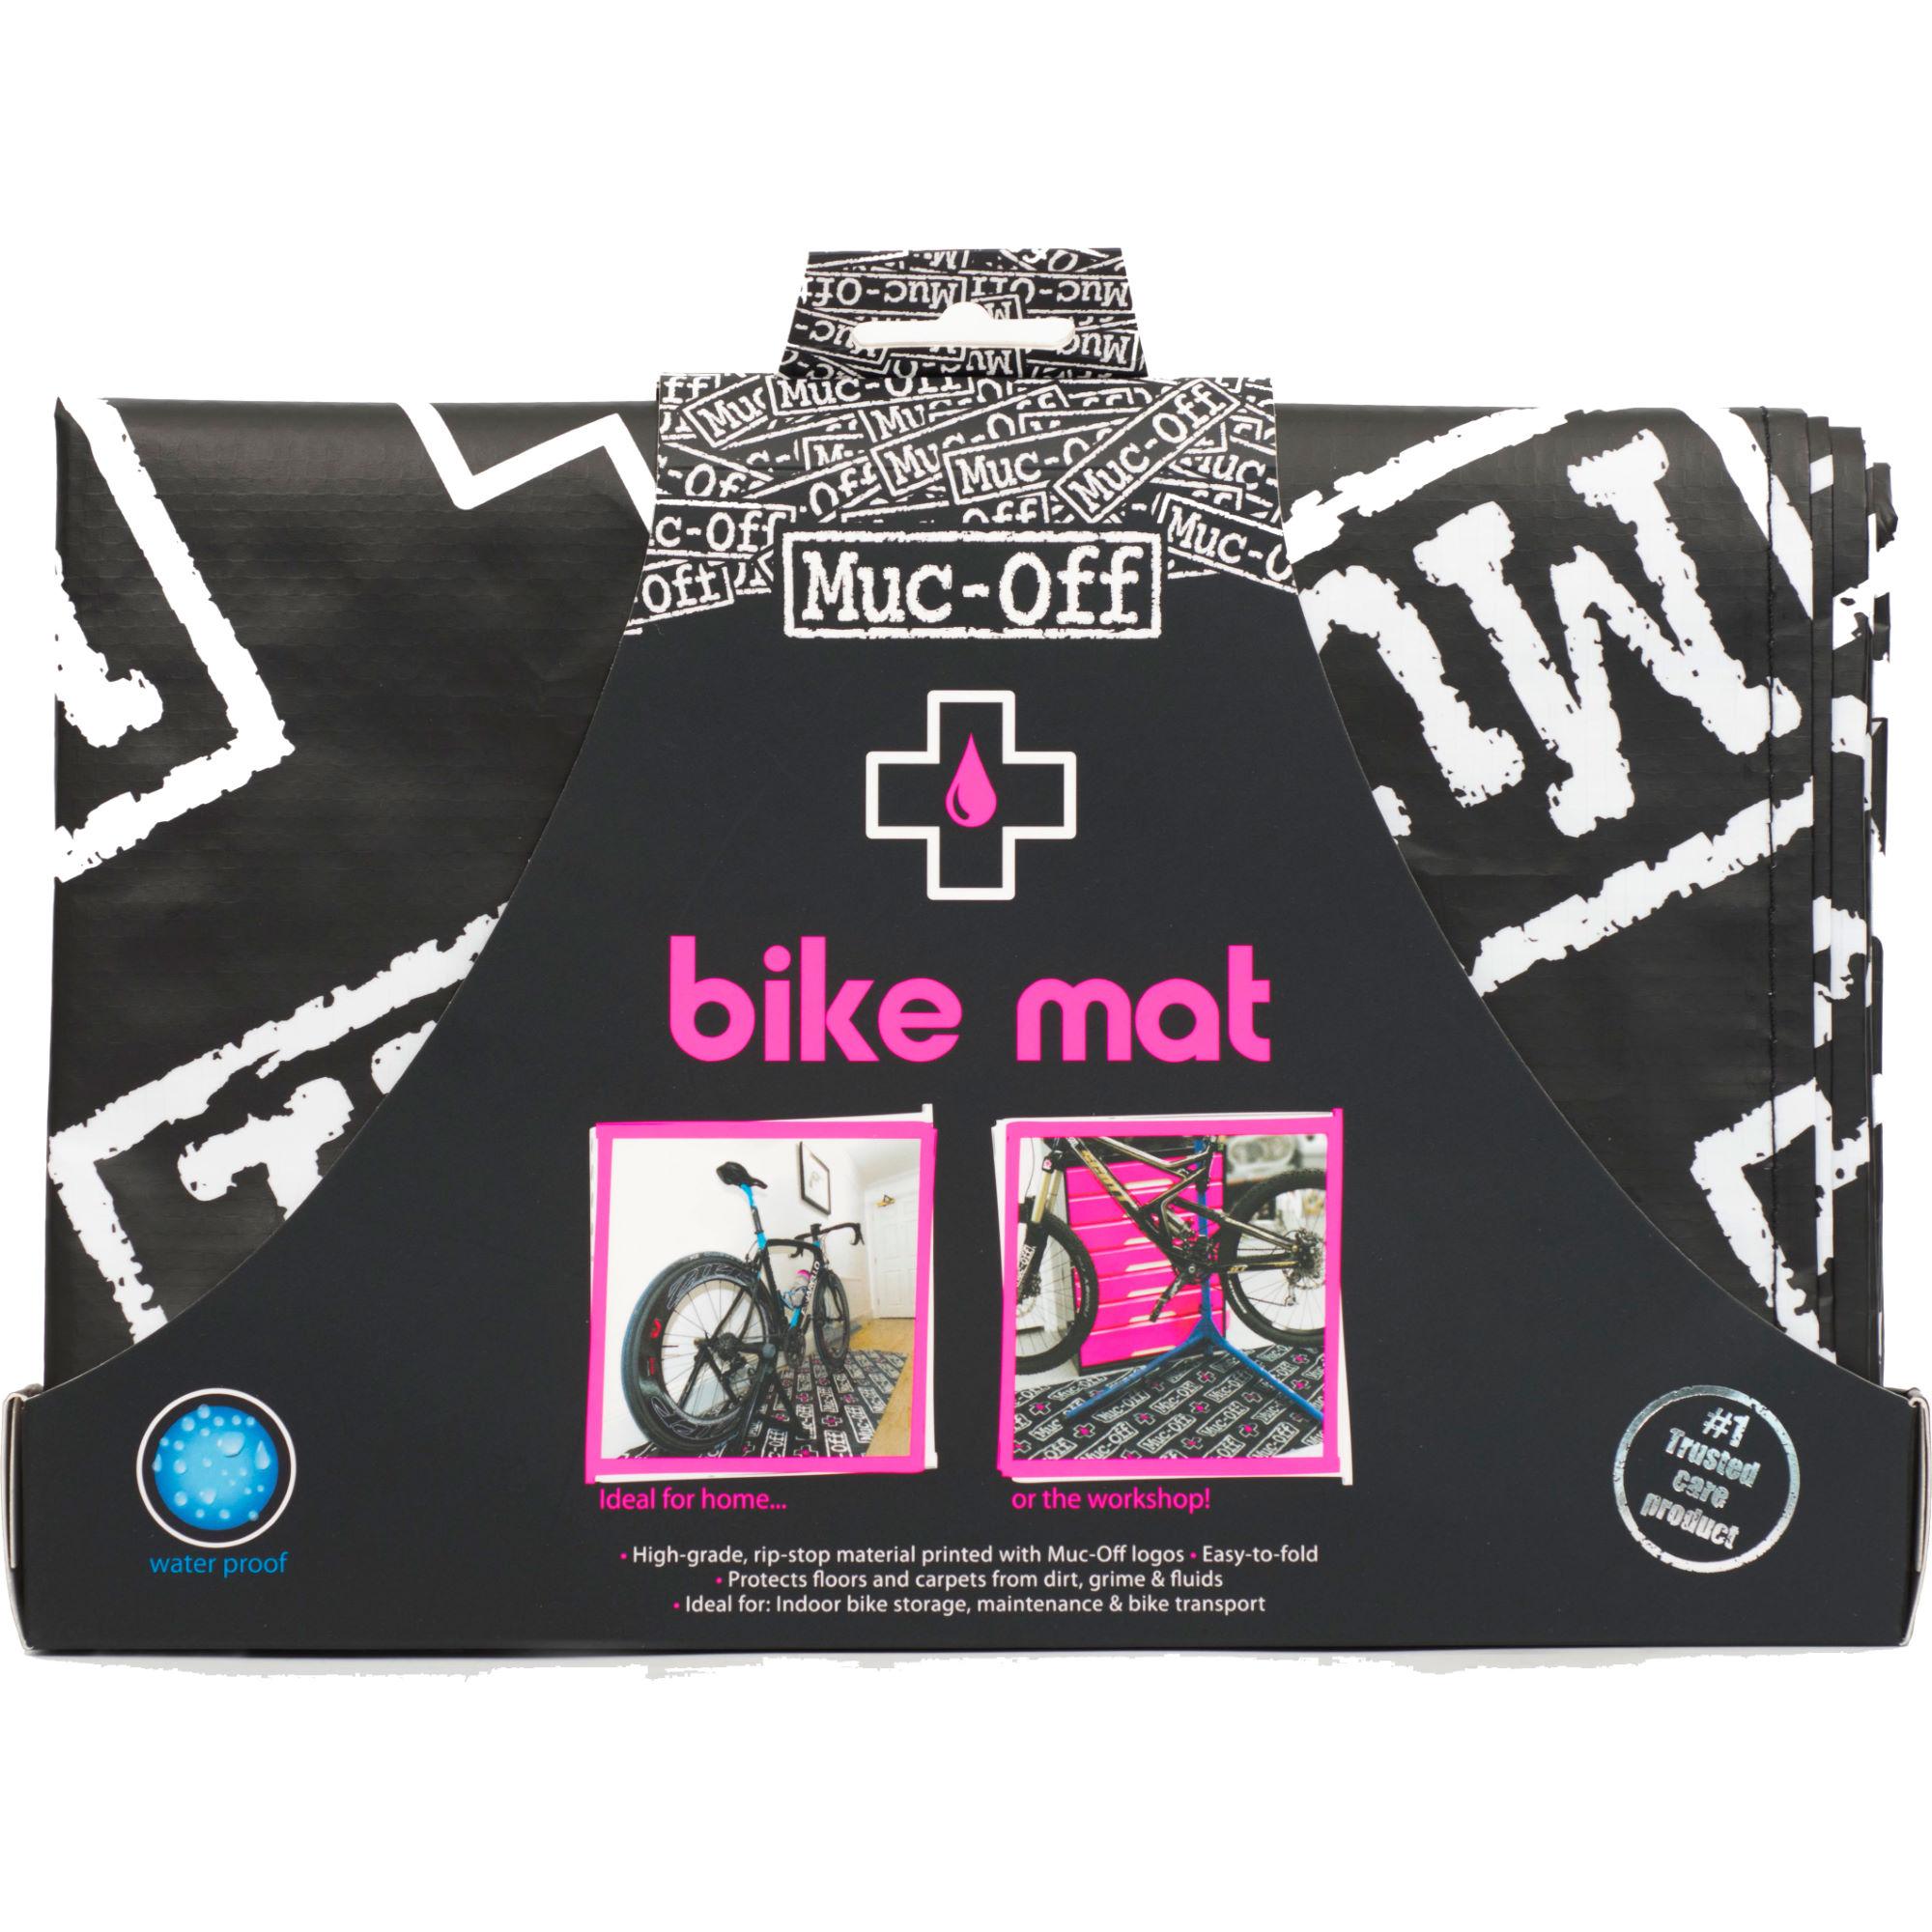 Muc-Off Bike Mat podložka, podložka bike mat, mucoff bike mat, muc-off podložka